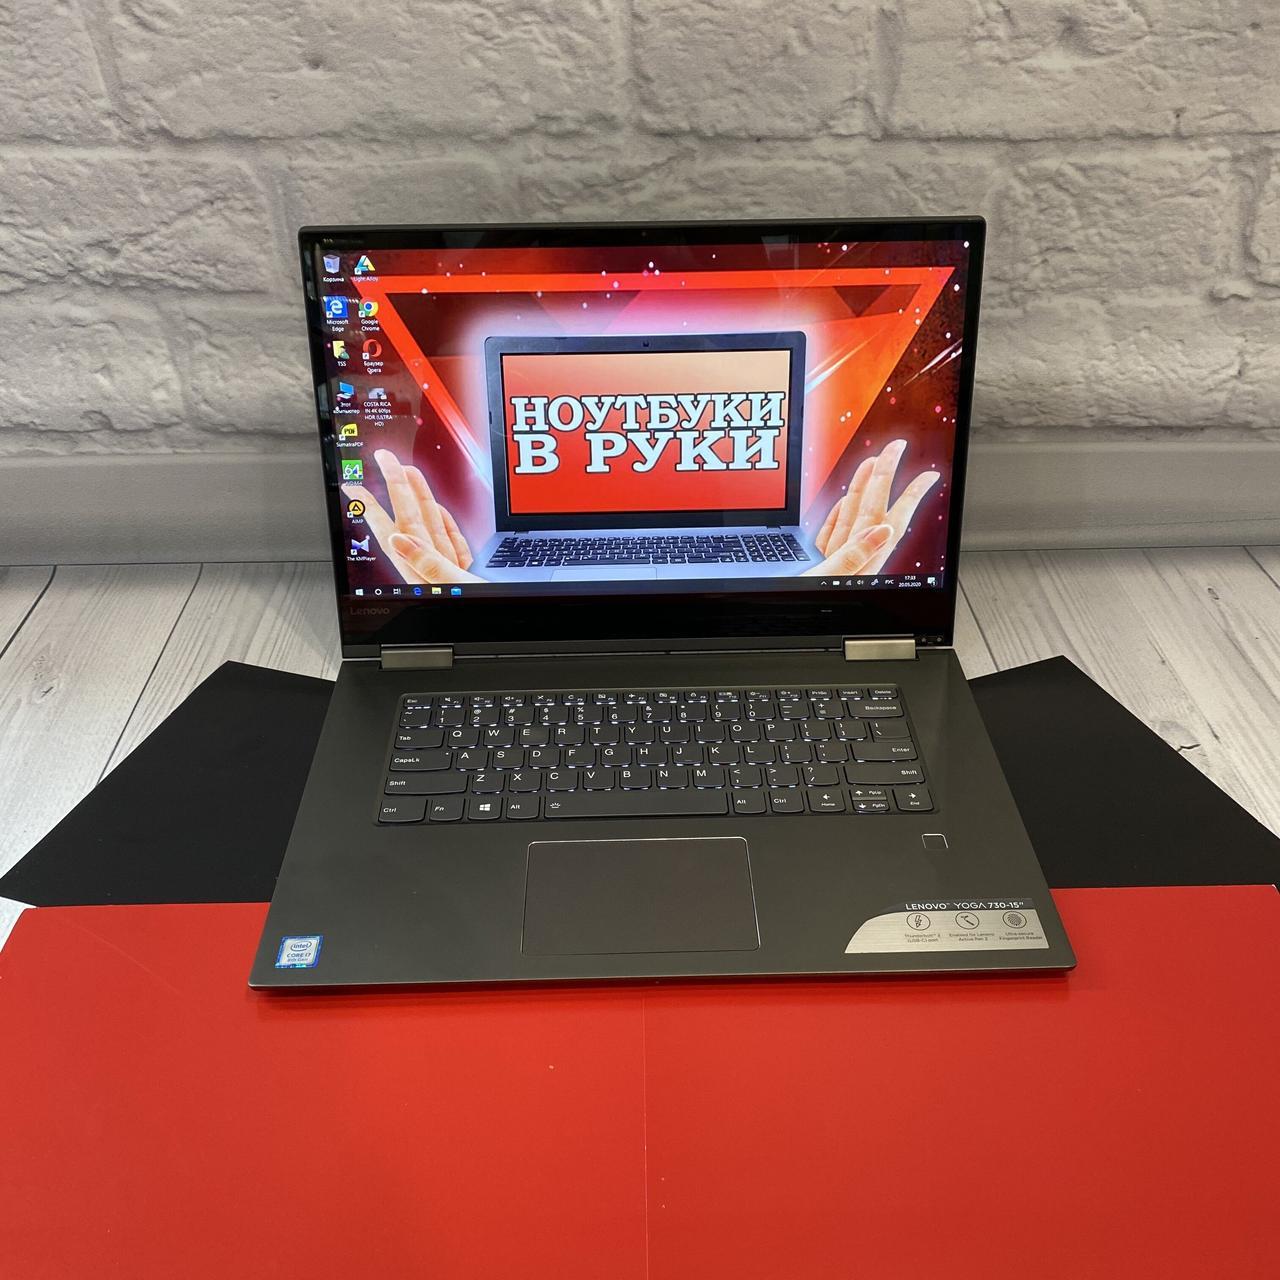 НОУТБУК Lenovo Yoga 730 15 (i7- 8550U/ DDR4 8 GB / SSD 256 GB / UHD 620)